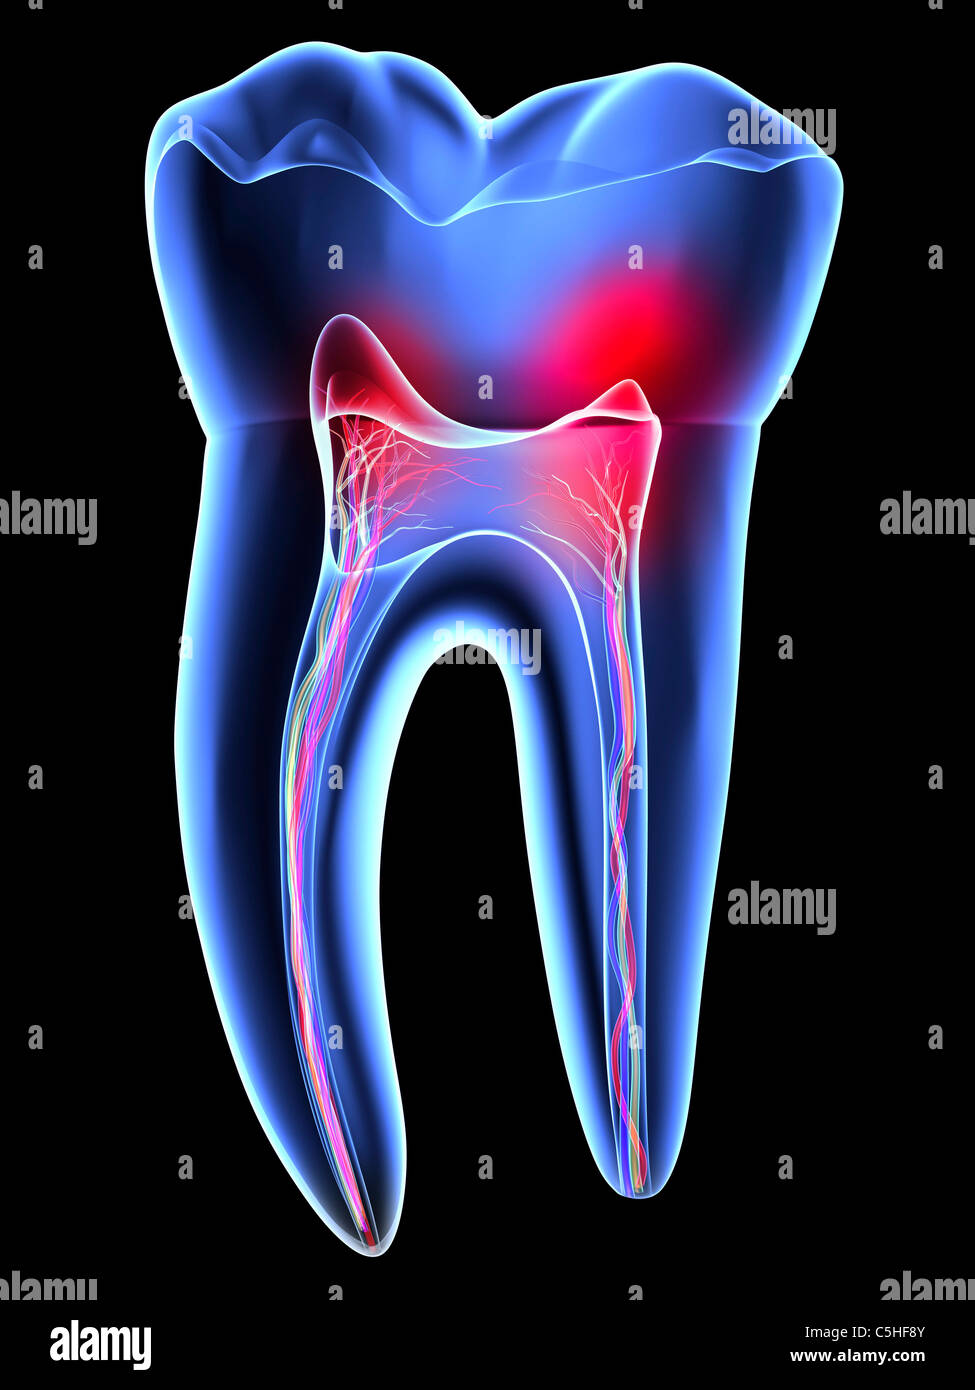 Zahnschmerzen, Zahnschmerzen Stockfoto